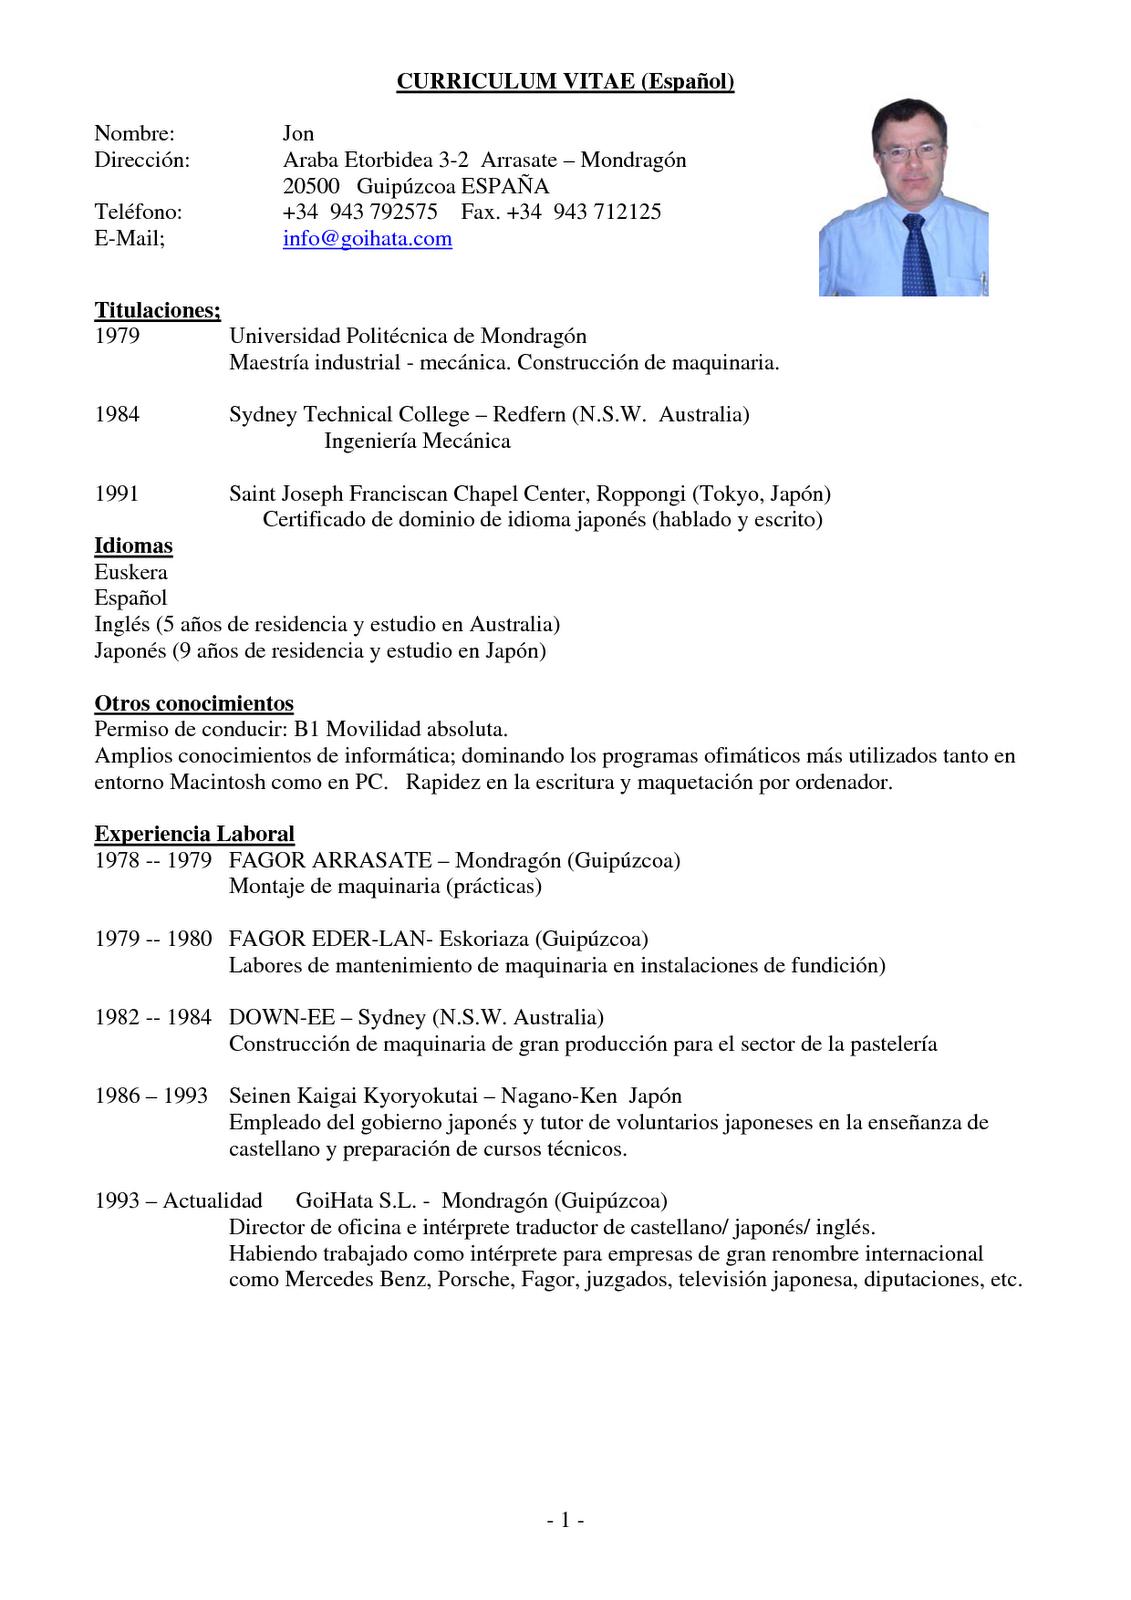 modelo de curriculum vitae medico